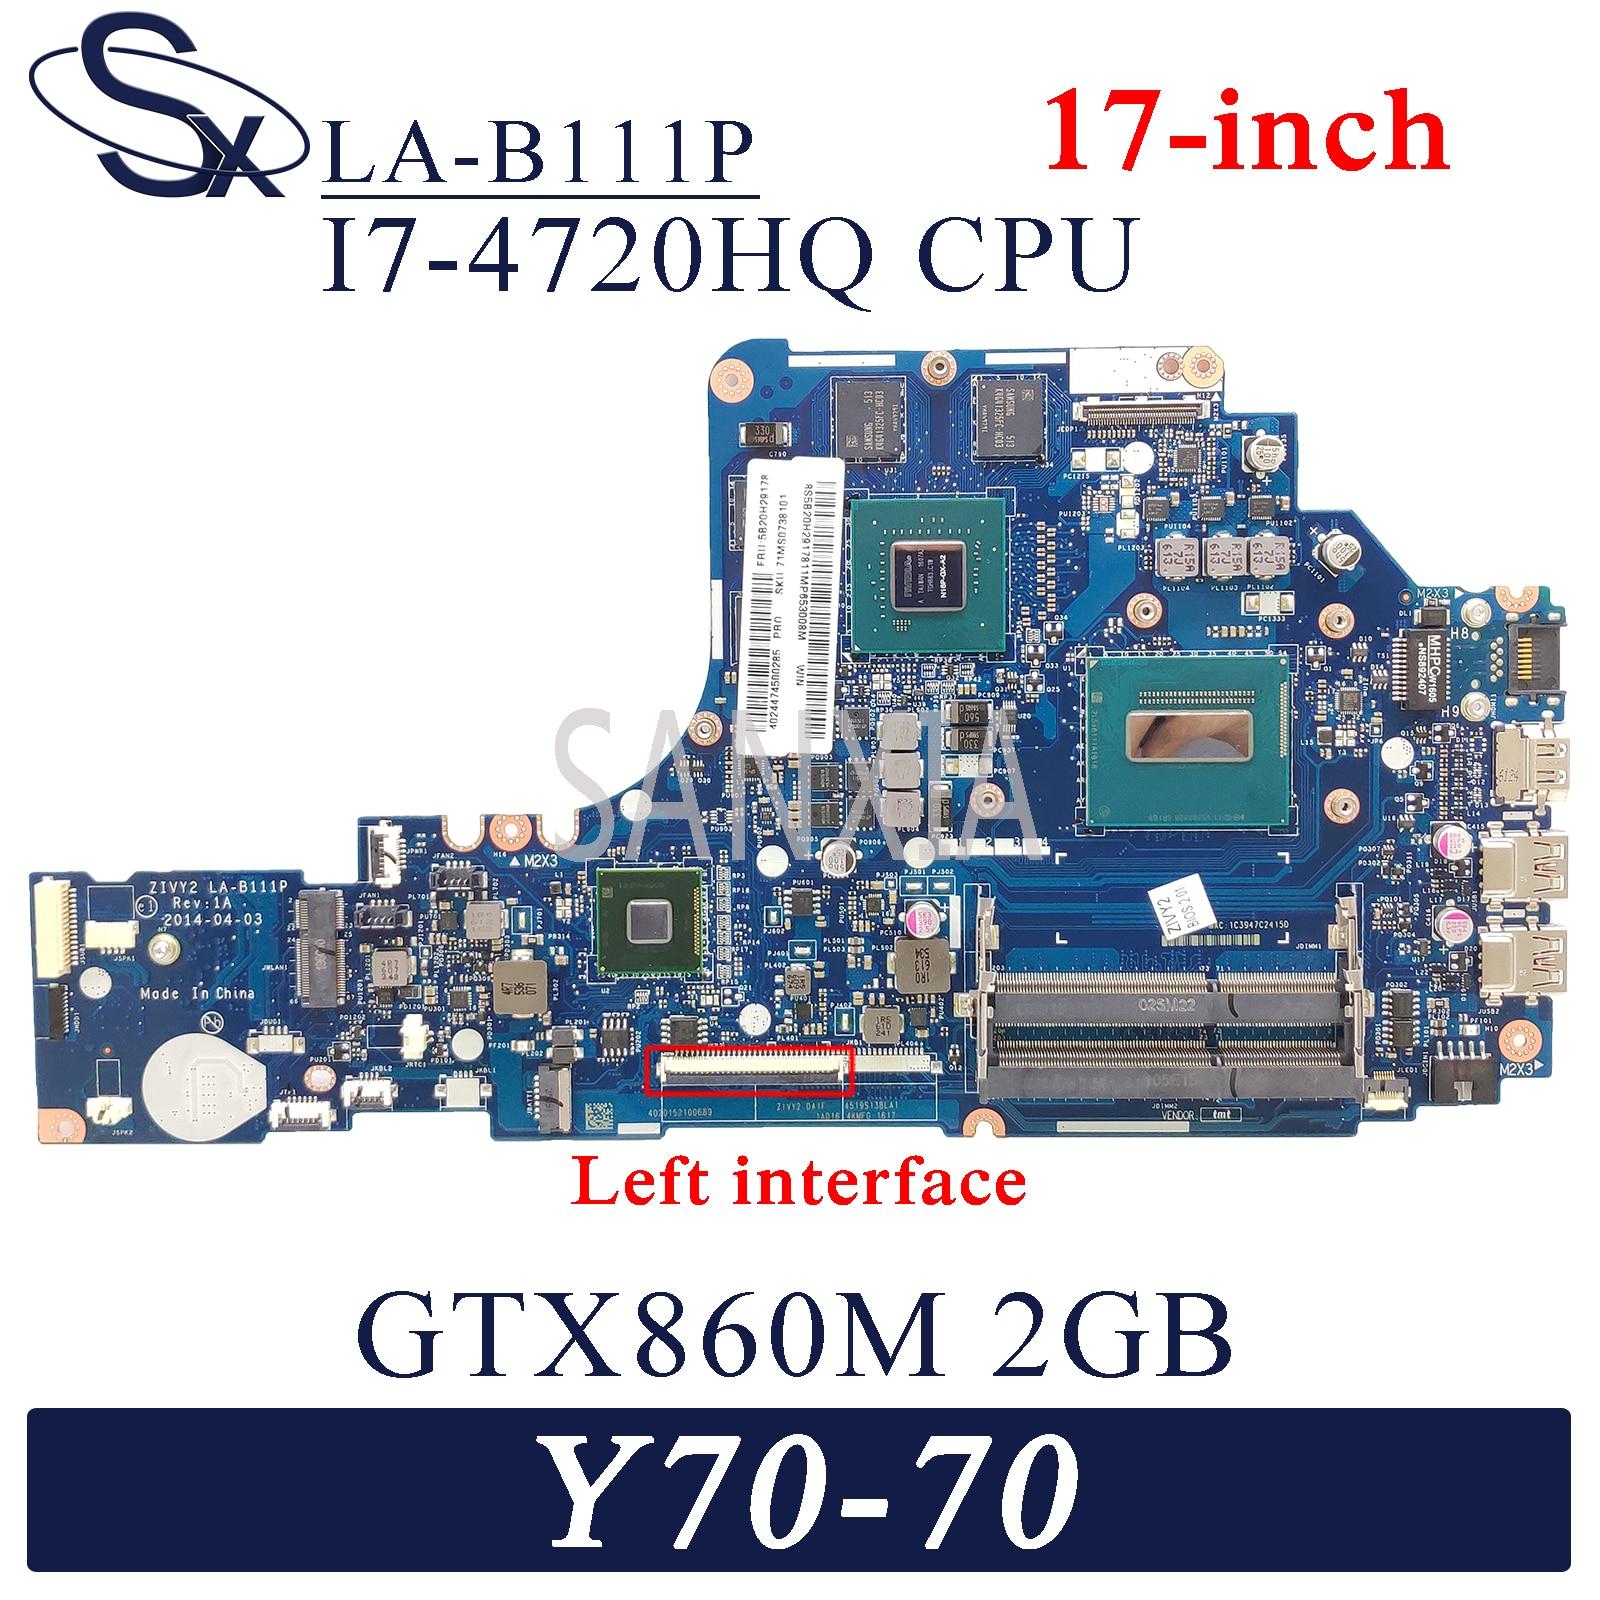 KEFU ZIVY2 LA-B111P اللوحة الأم للكمبيوتر المحمول لينوفو Y70-70 (17 بوصة) الأصلي اللوحة الرئيسية I7-4720HQ/4710HQ GTX860M-2GB